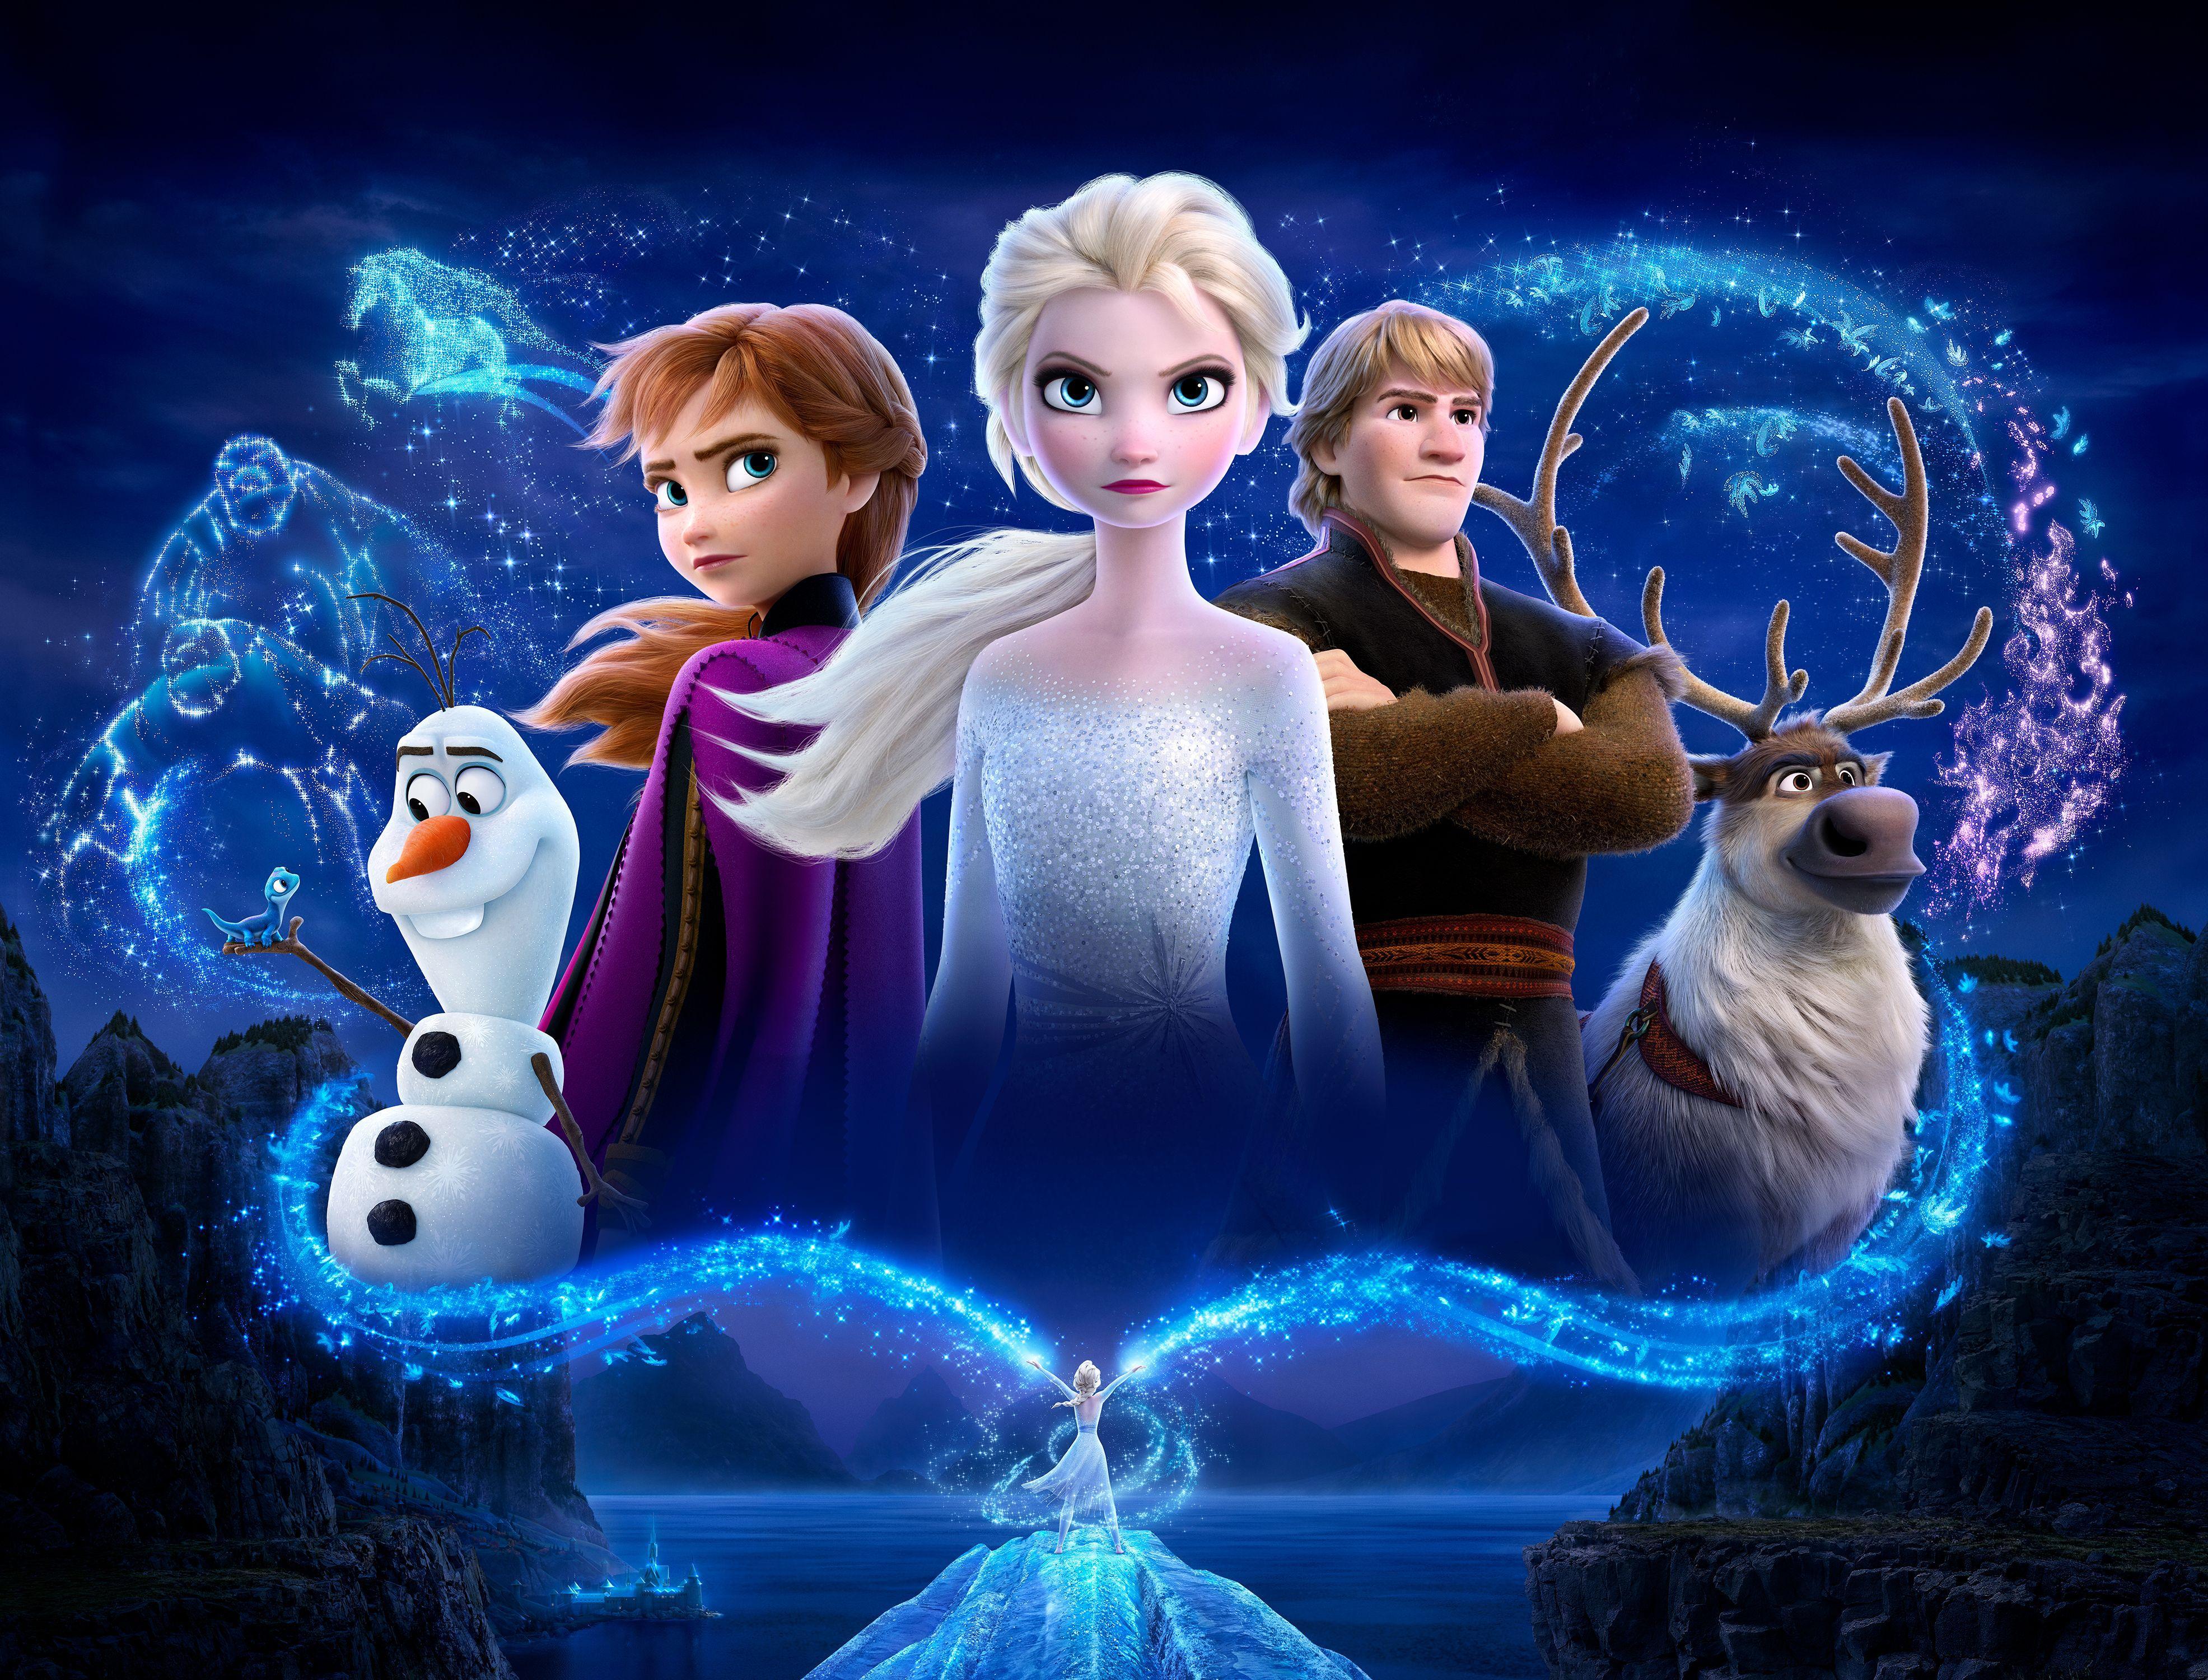 Frozen 2 4k Wallpapers Top Free Frozen 2 4k Backgrounds Wallpaperaccess